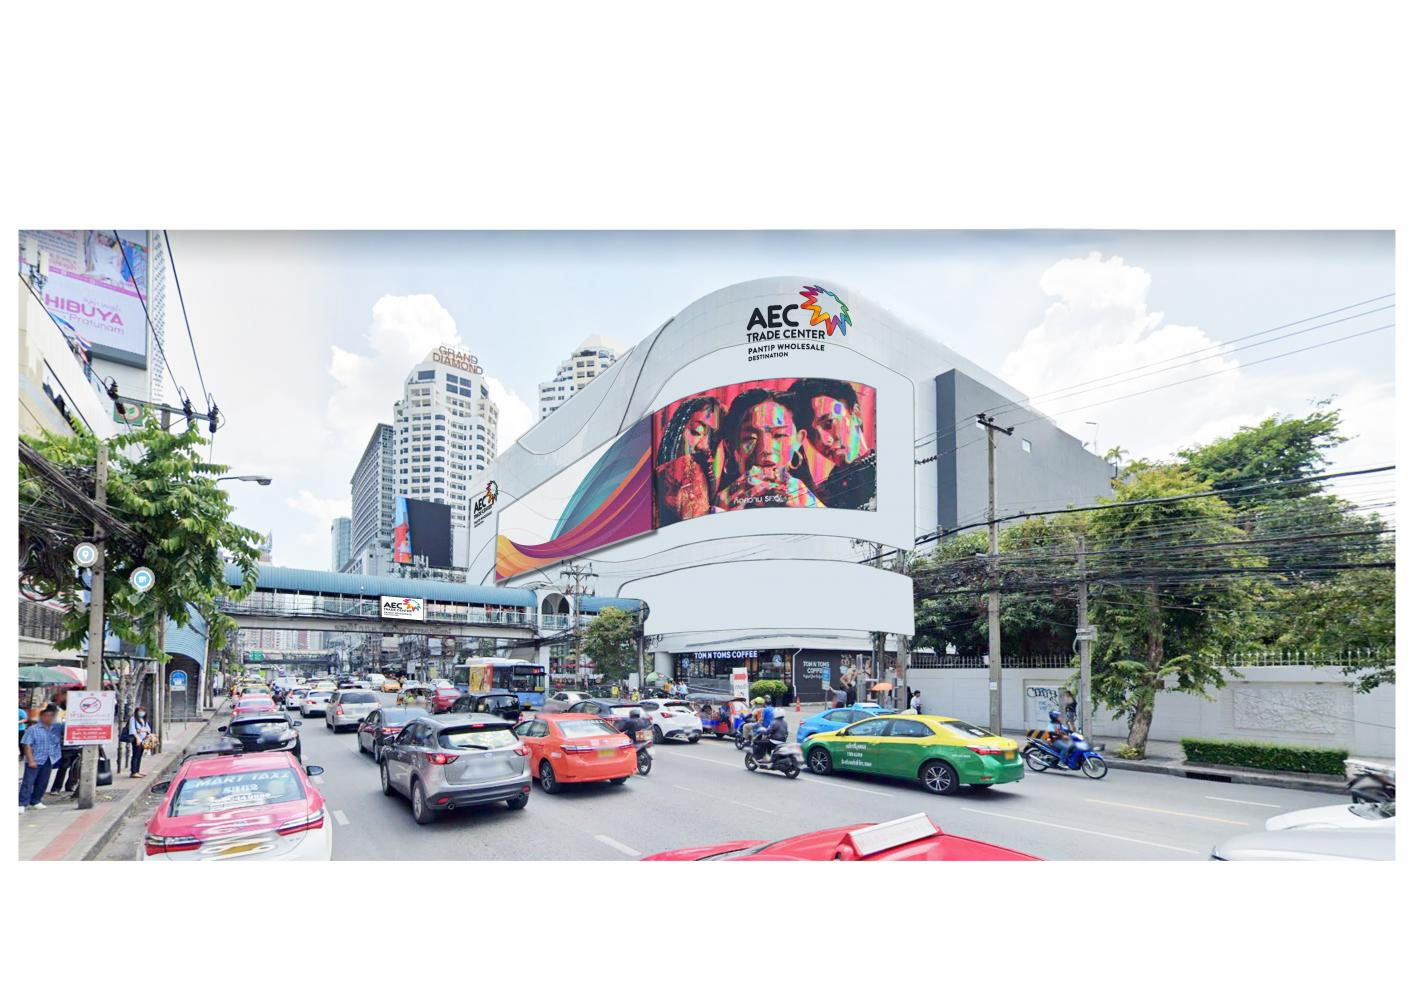 An artist's rendition of the AEC Trade Centre-Pantip Wholesale Destination in Bangkok's Pratunam area.